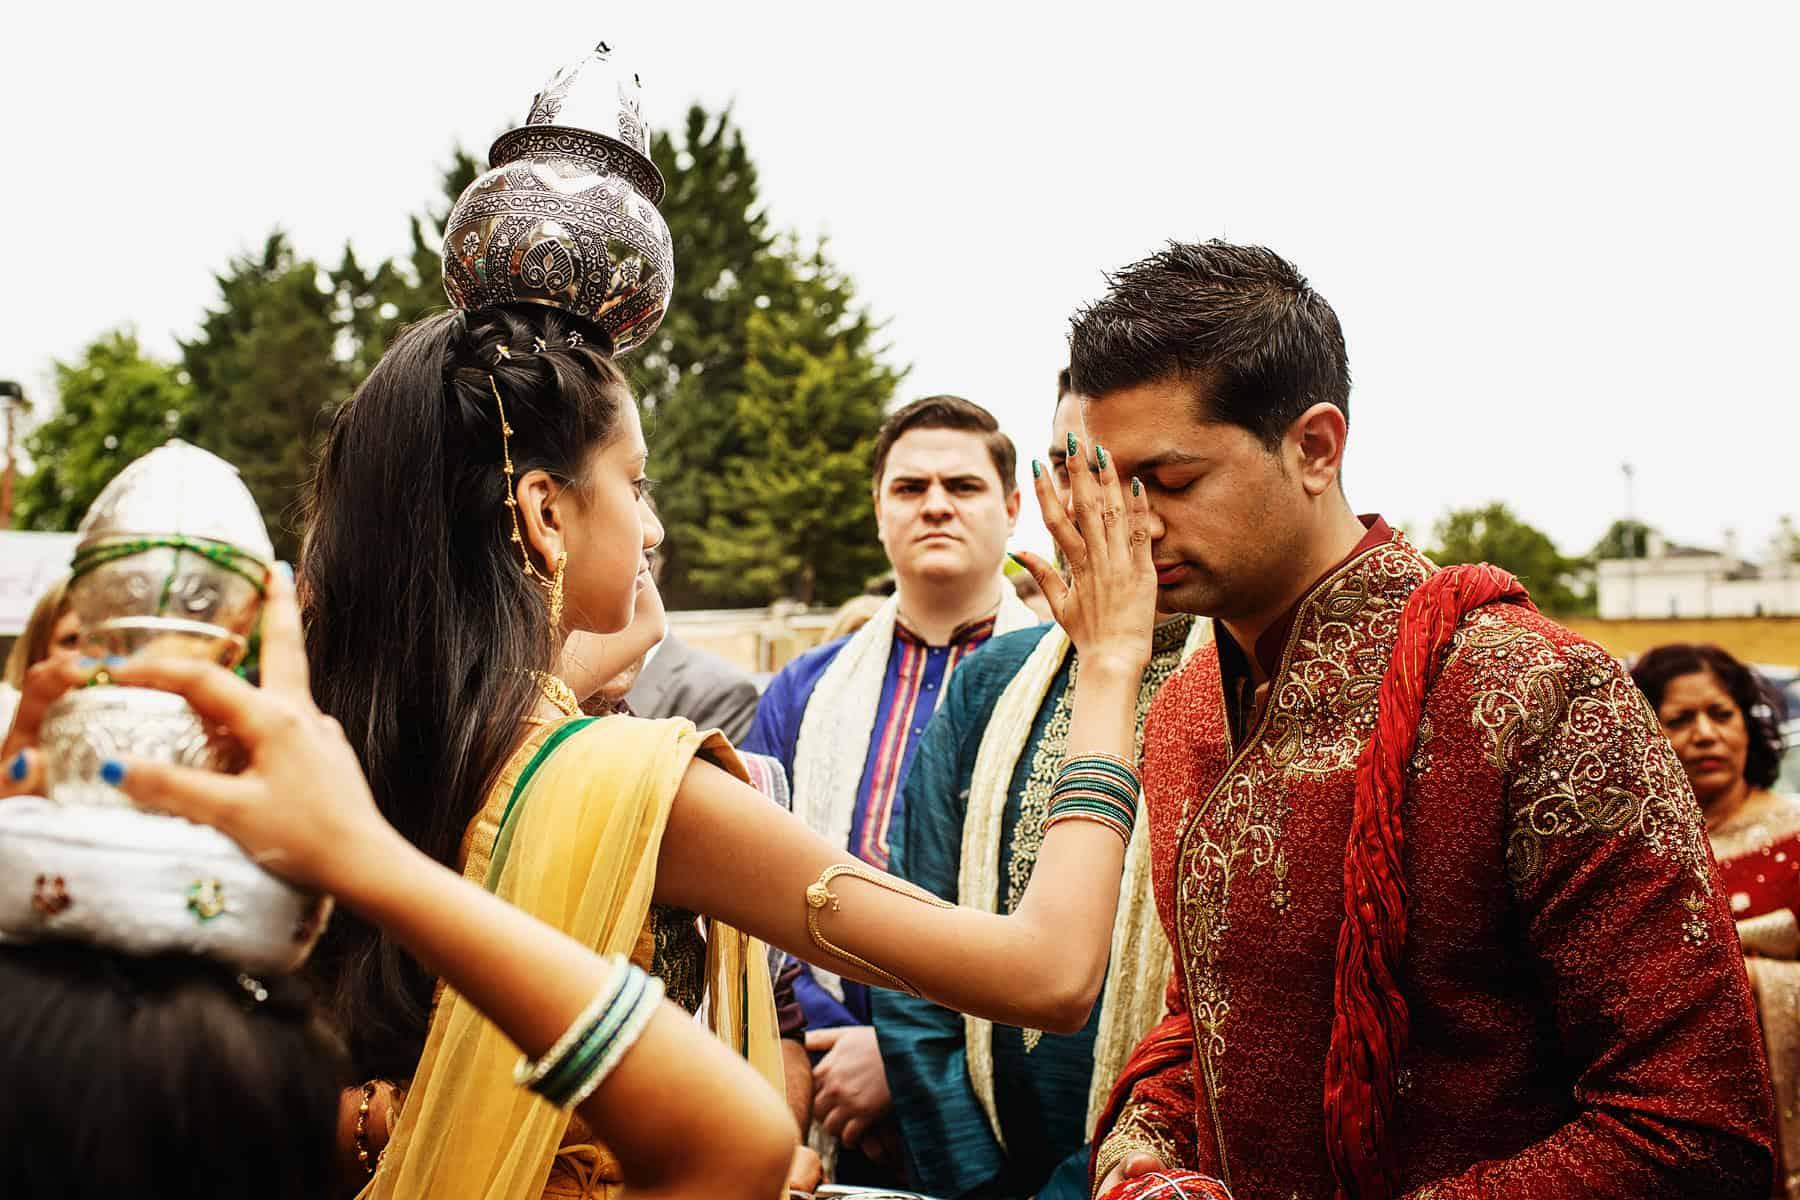 stanmore mandir hindu wedding